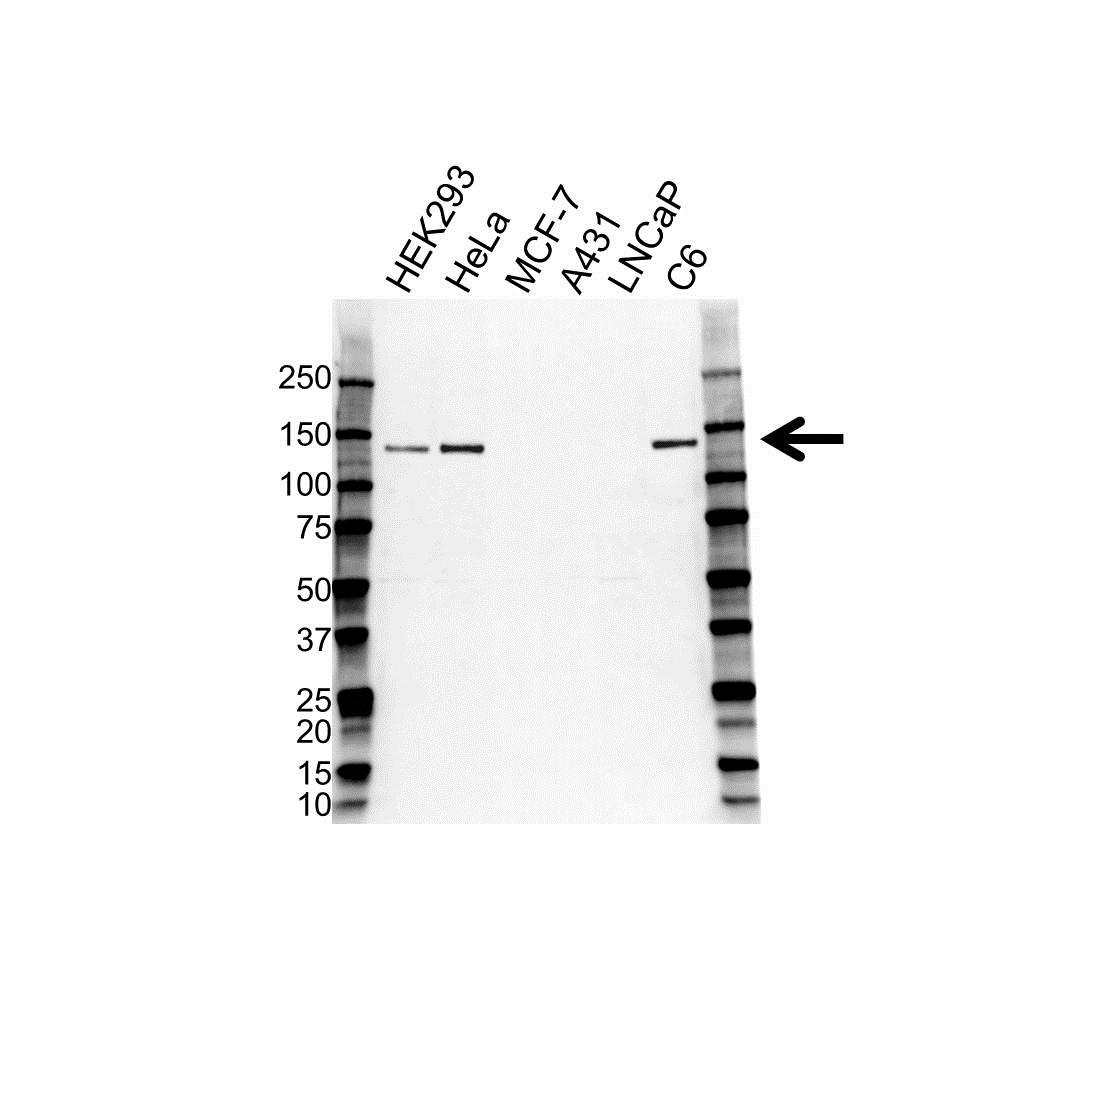 N-Cadherin Antibody (PrecisionAb<sup>TM</sup> Antibody) | OTI2G7 gallery image 1